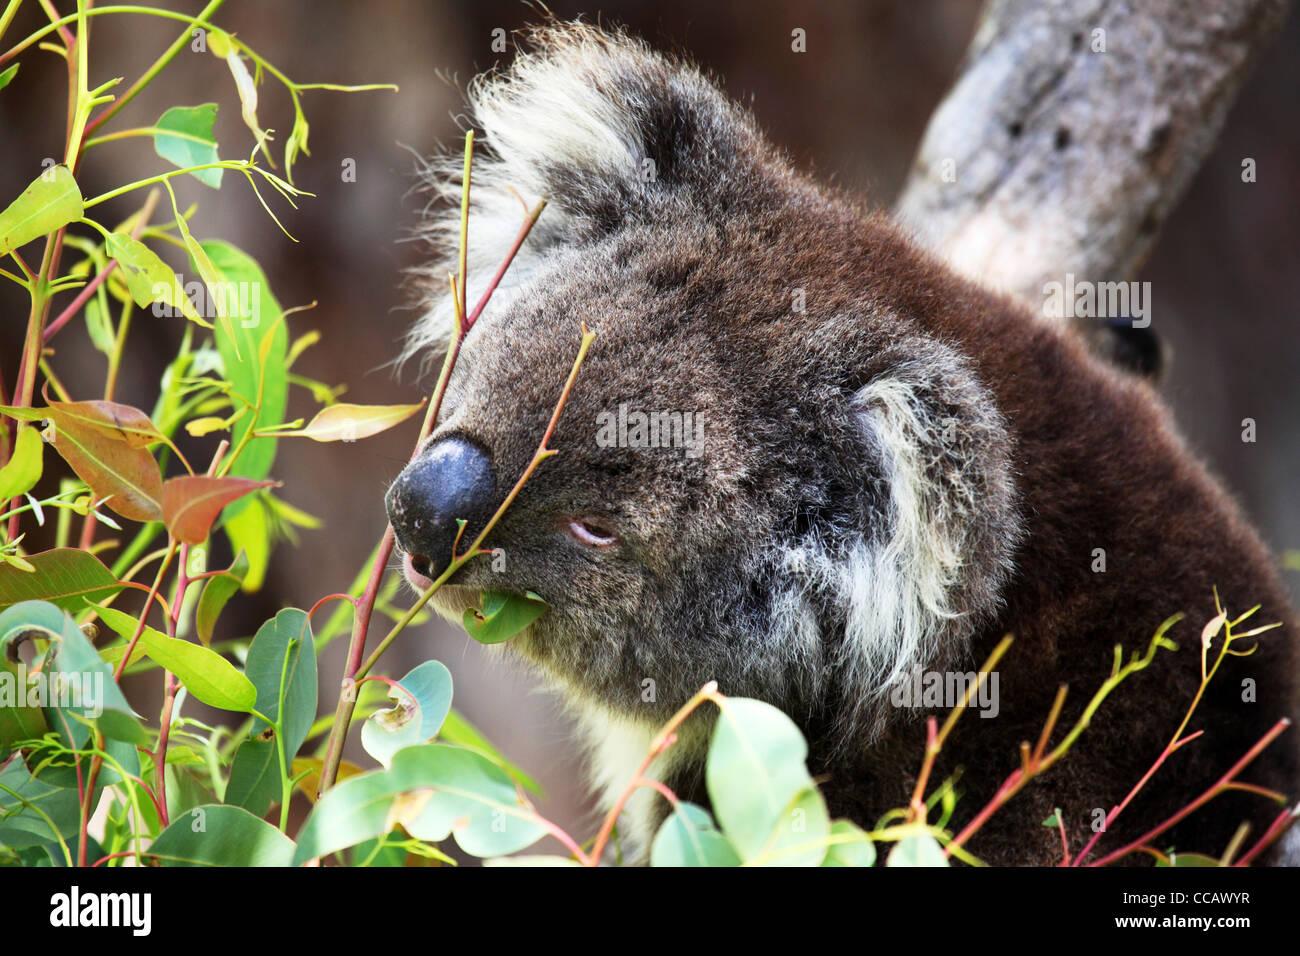 A koala (Phascolarctos cinereus) feeds on eucalyptus leaves, Yanchep National Park, Western Australia, Australia. - Stock Image